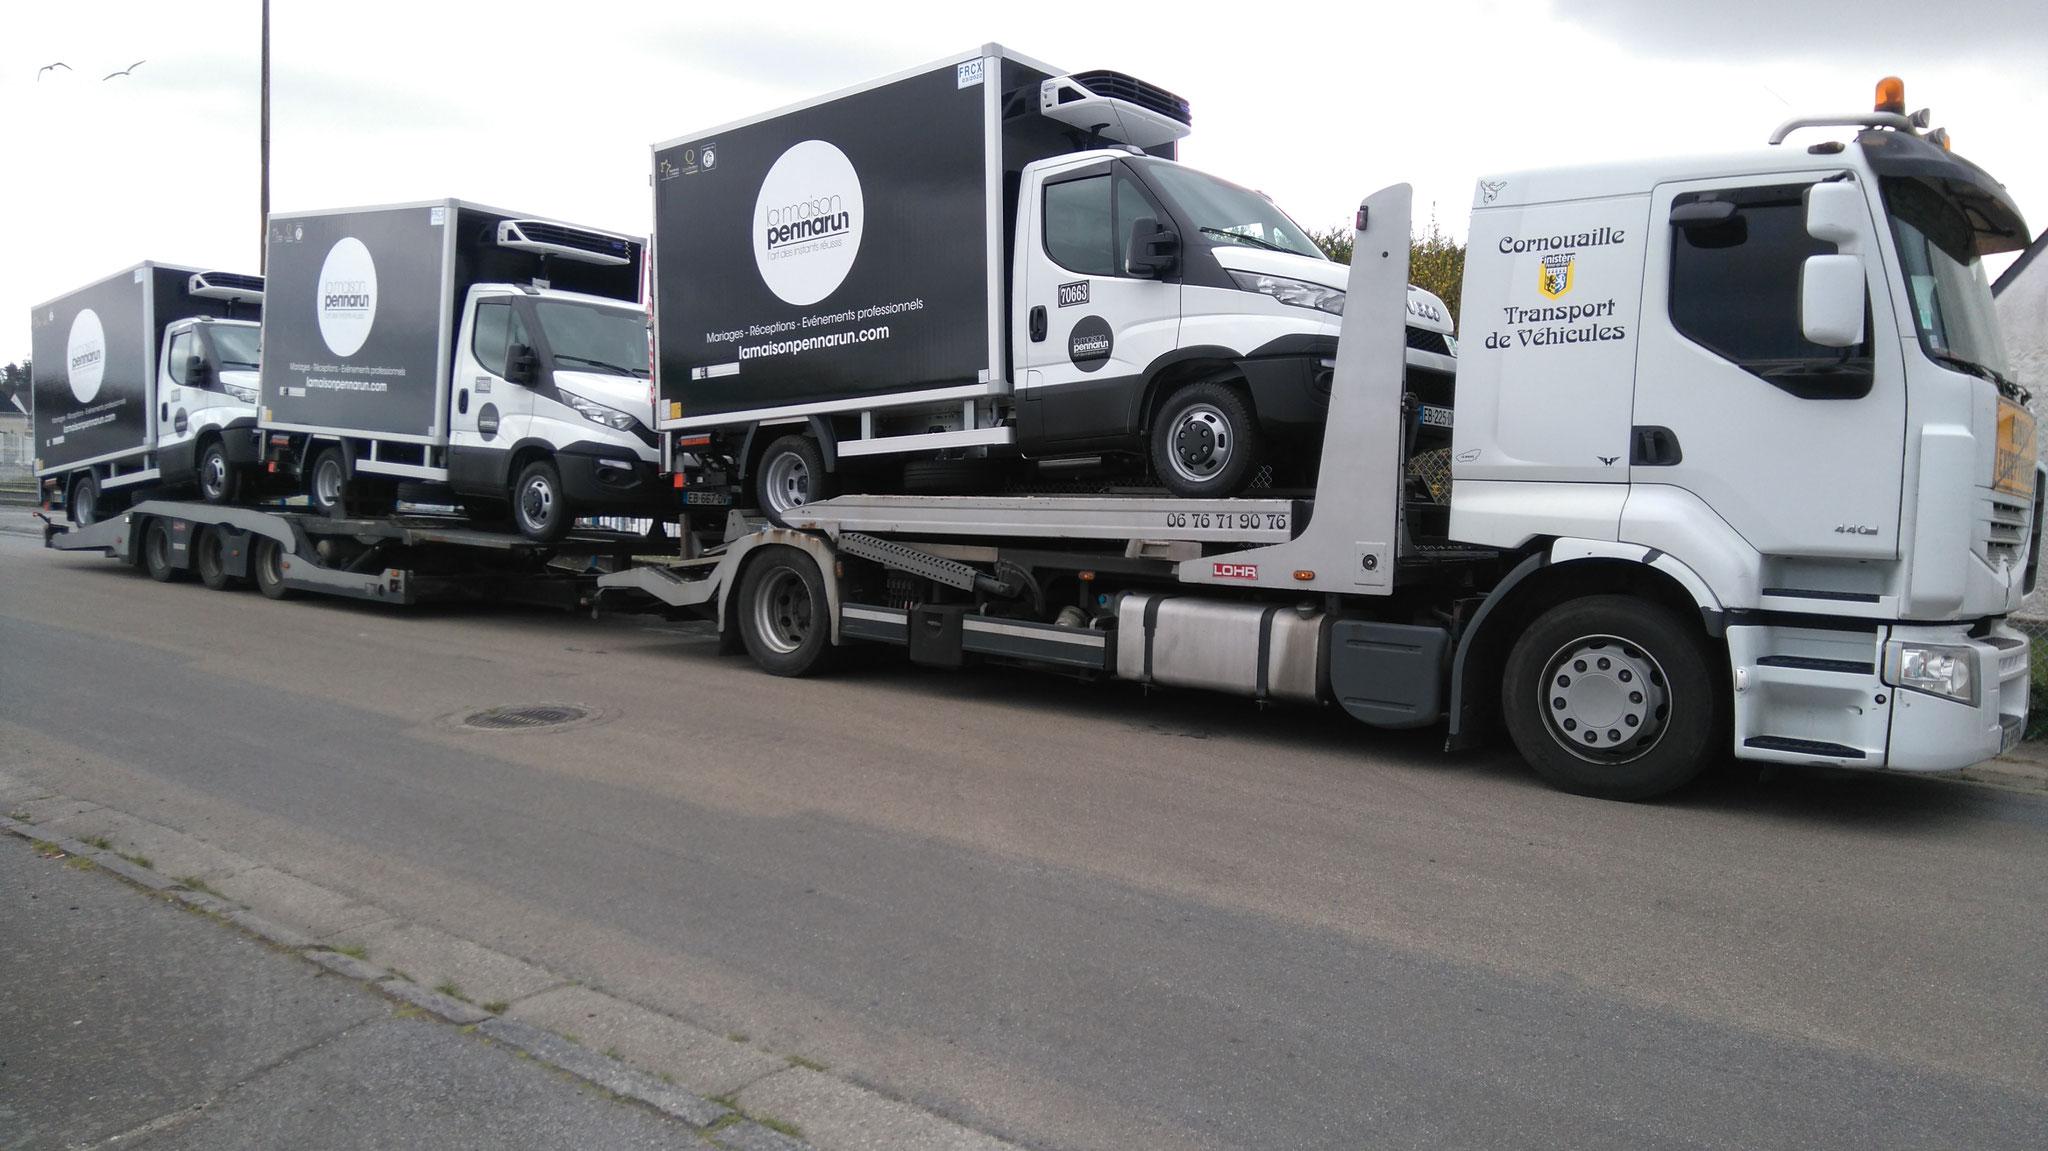 Transport de véhicules frigorifiques